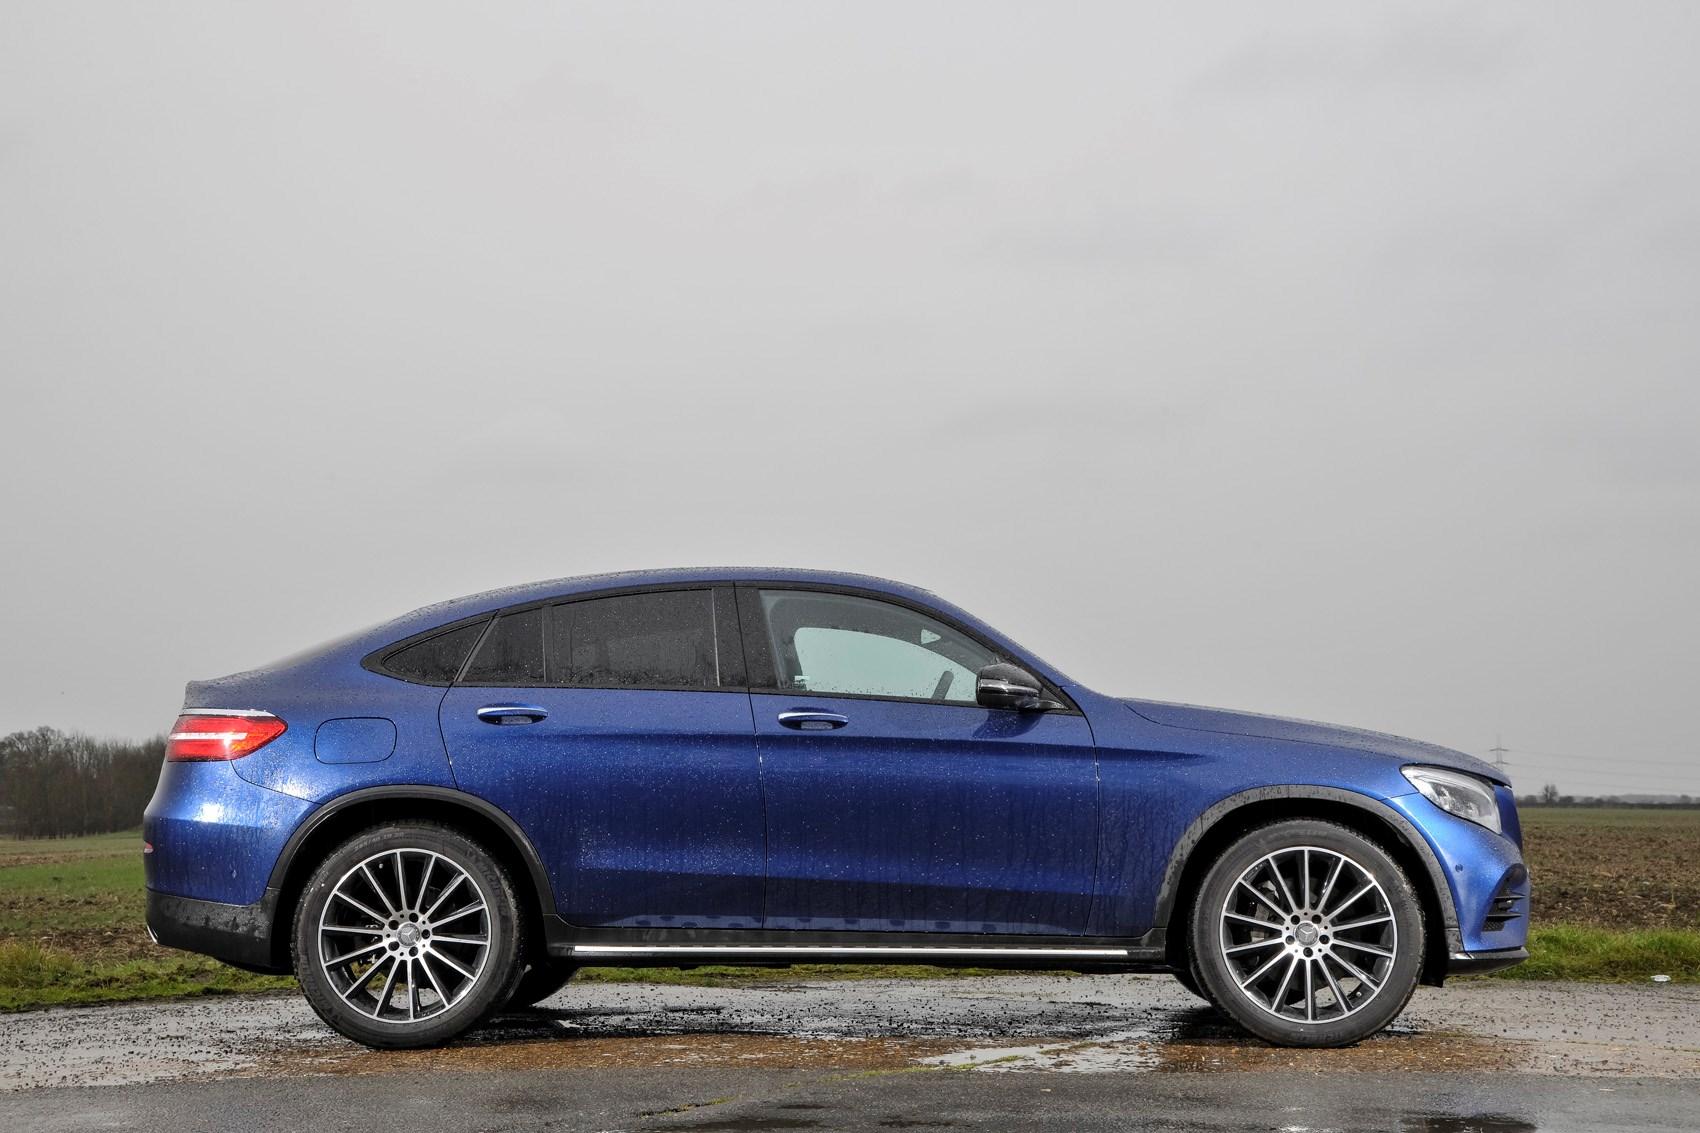 Mercedes benz glc class coupe 2016 features for Mercedes benz exterior parts